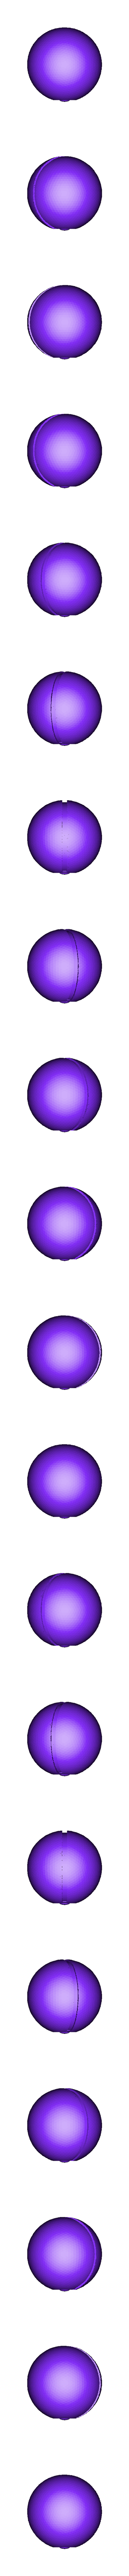 Pokeball ~ Brut.stl Download free STL file CLASSIC PokeBall • Model to 3D print, LuliasMartch